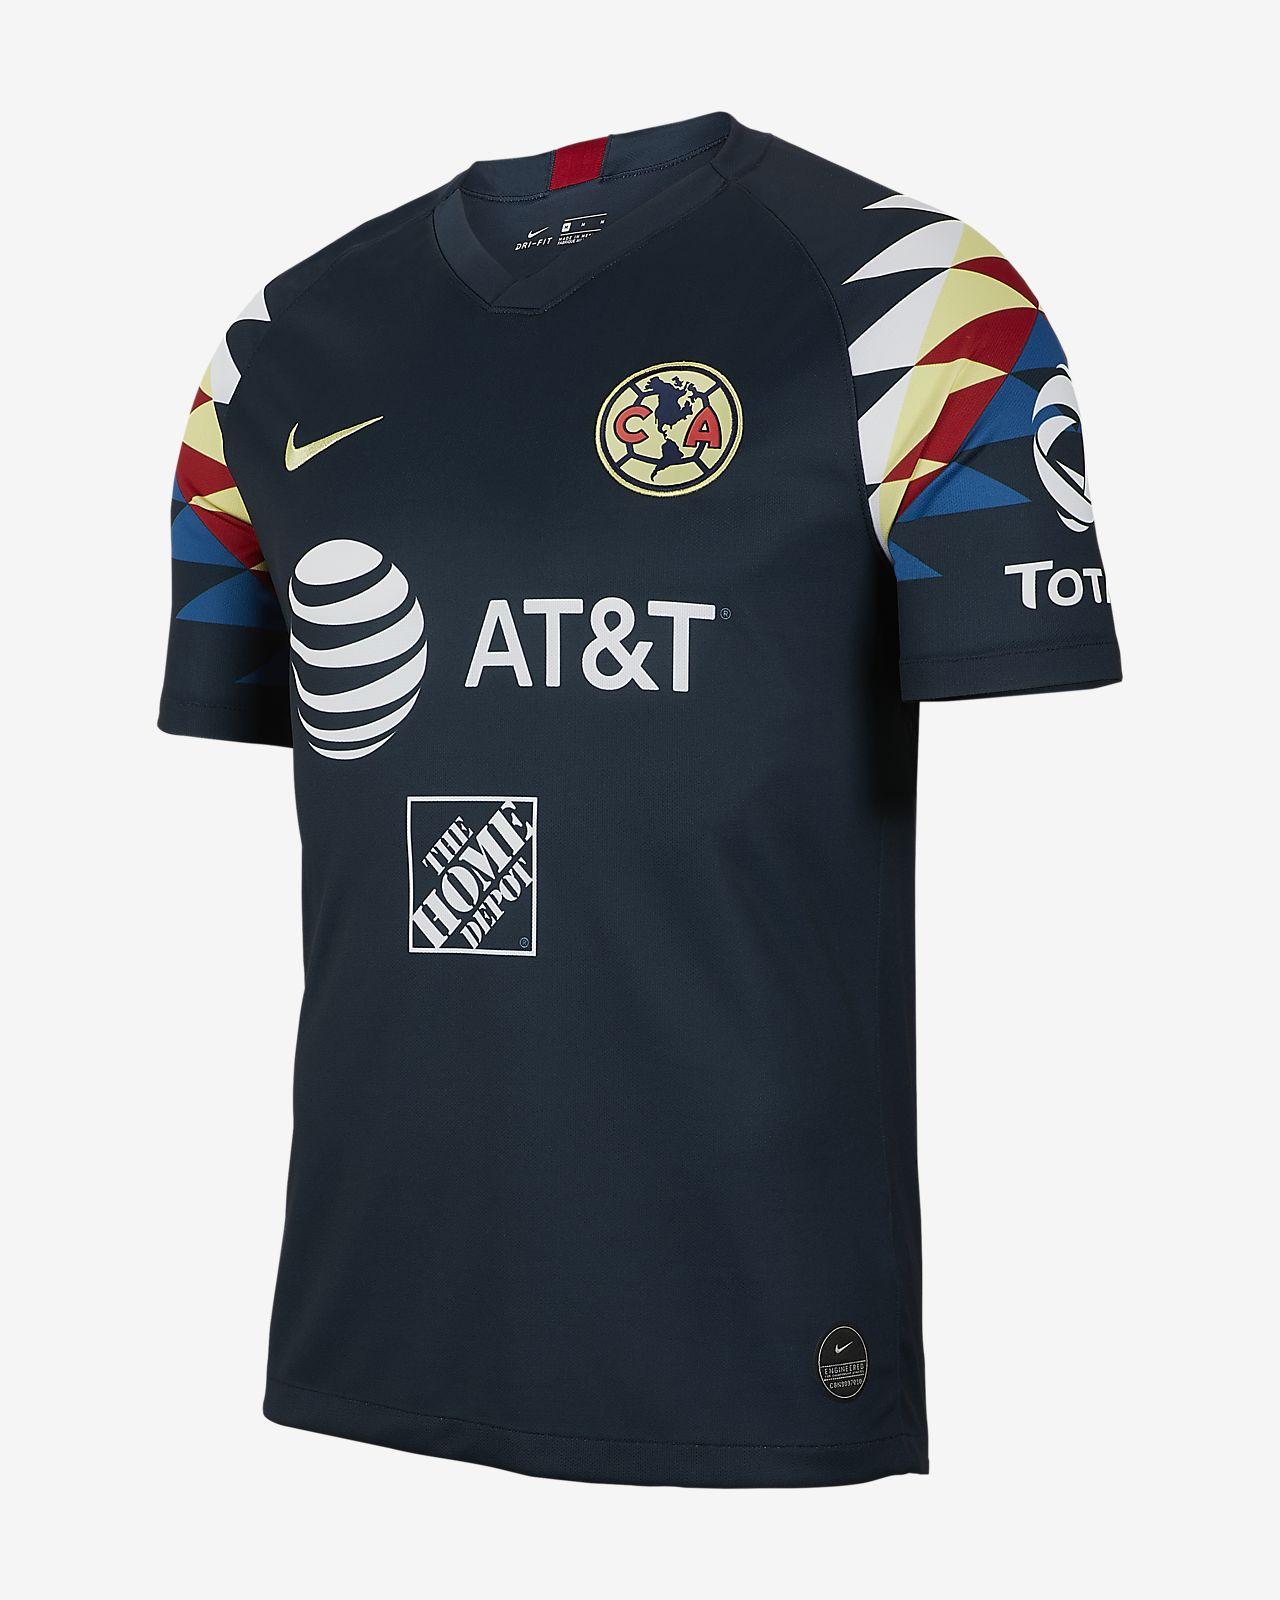 online retailer 2494f 6c67f Club América 2019/20 Stadium Away Men's Soccer Jersey